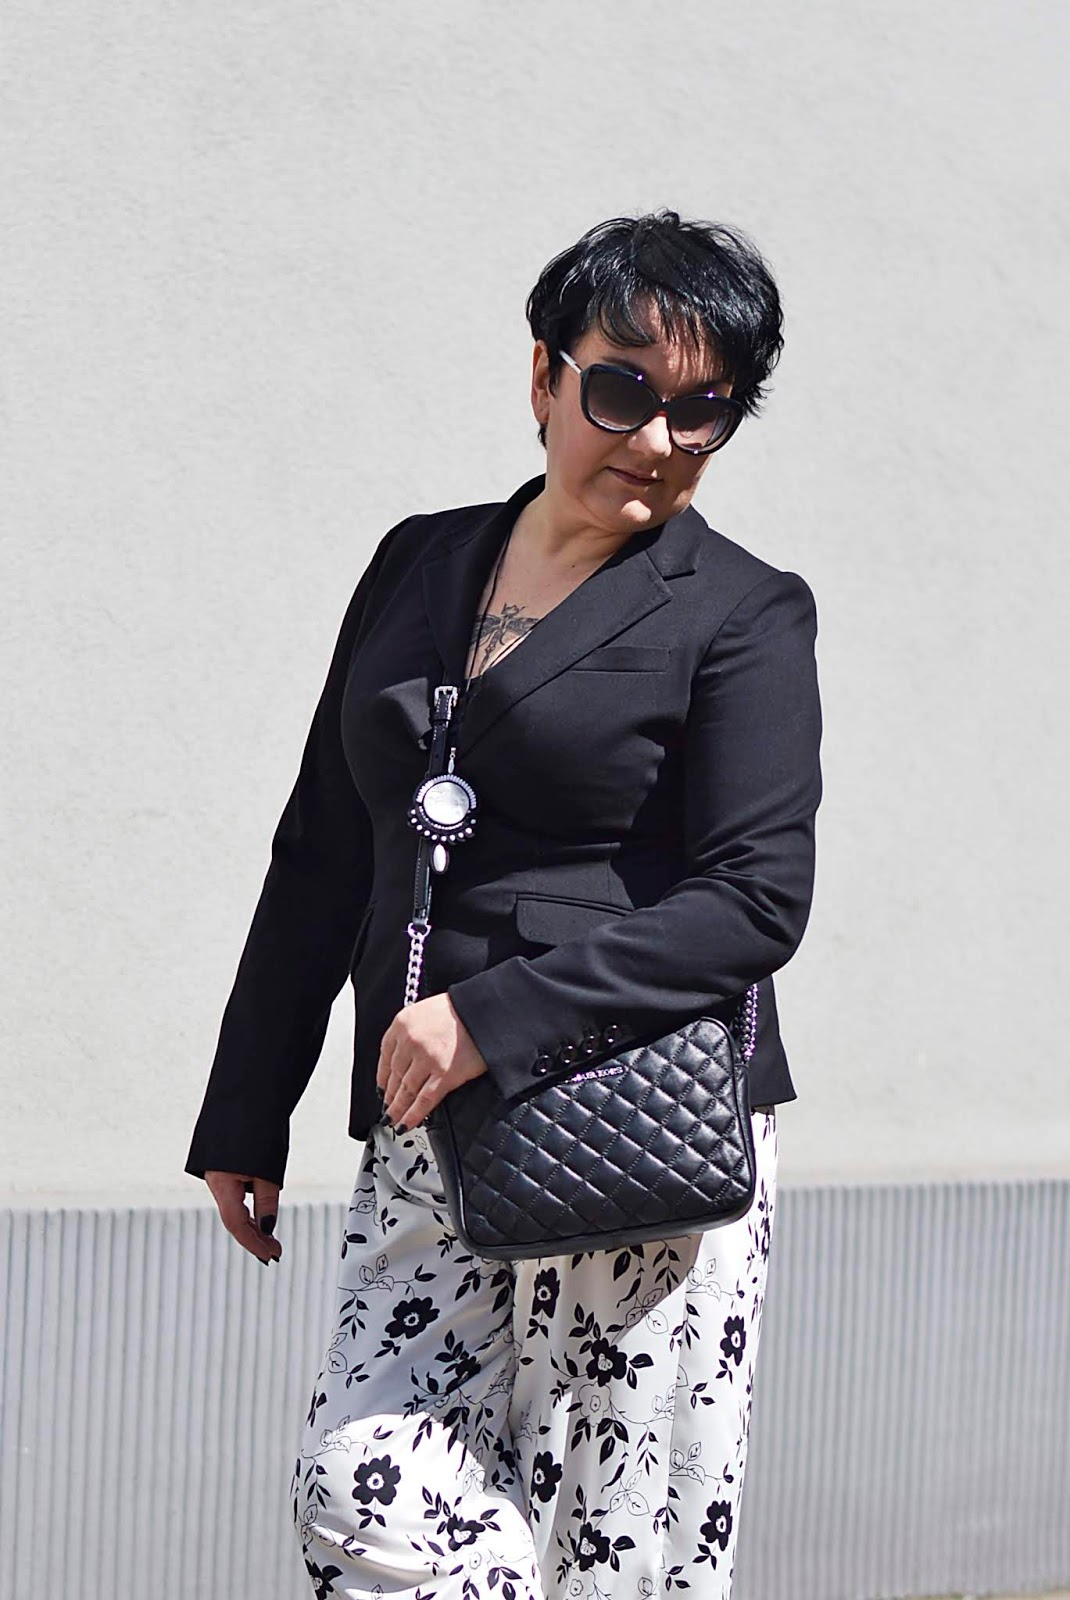 H&M back jacket, pajamas pants, black and white fashion